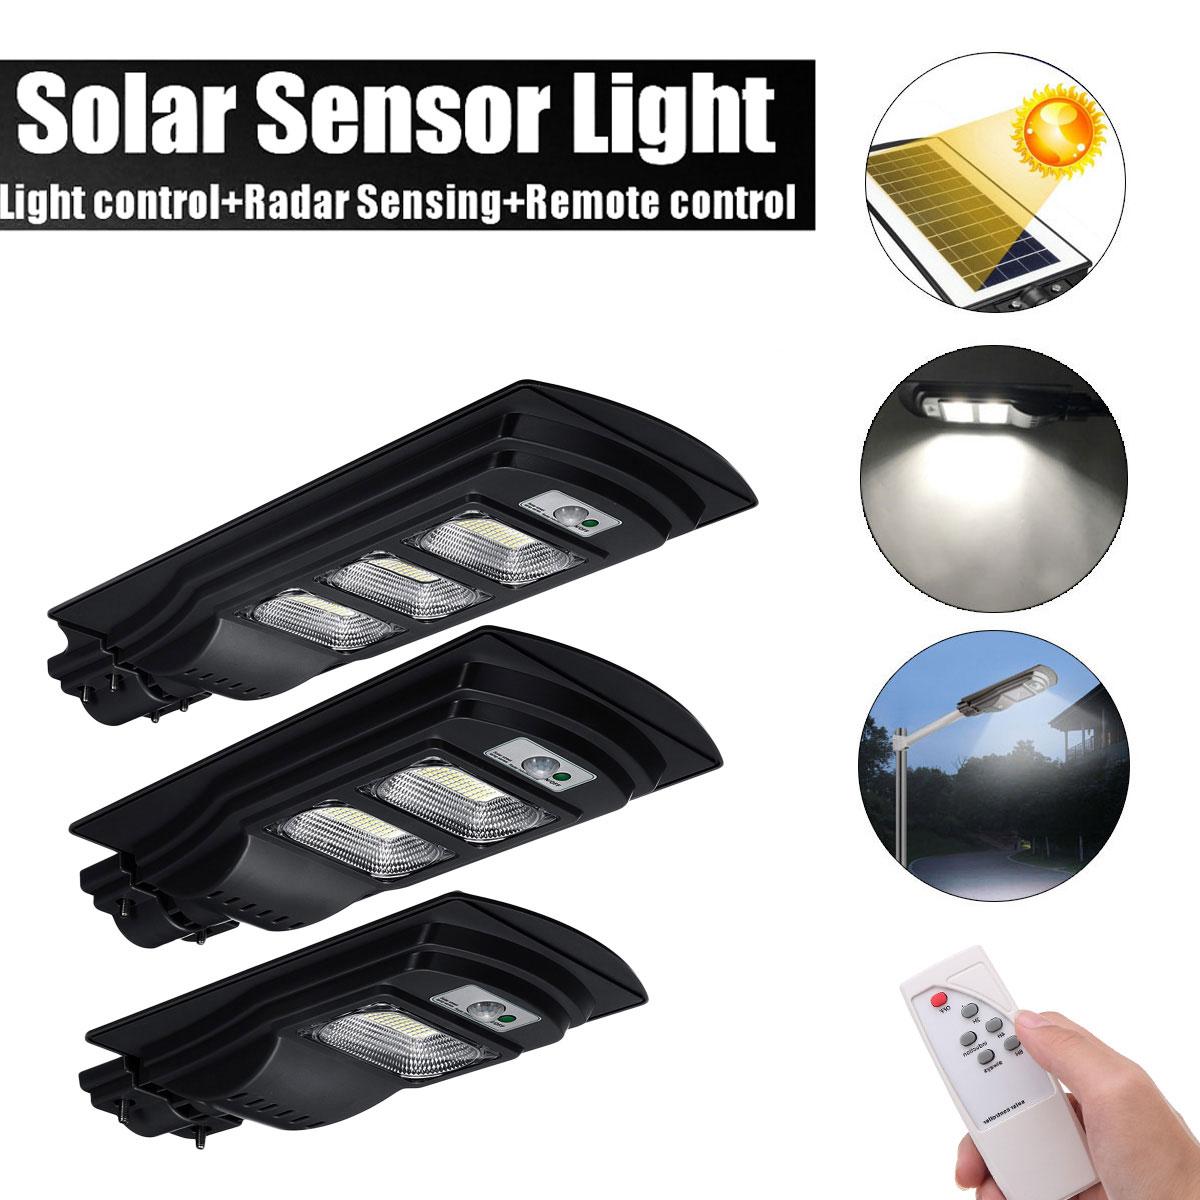 30 W/600 W/90 W LED Solar Straße Licht Solar Licht Radar PIR Motion Sensor Wand Timing lampe + Remote comtrol Wasserdicht für Plaza